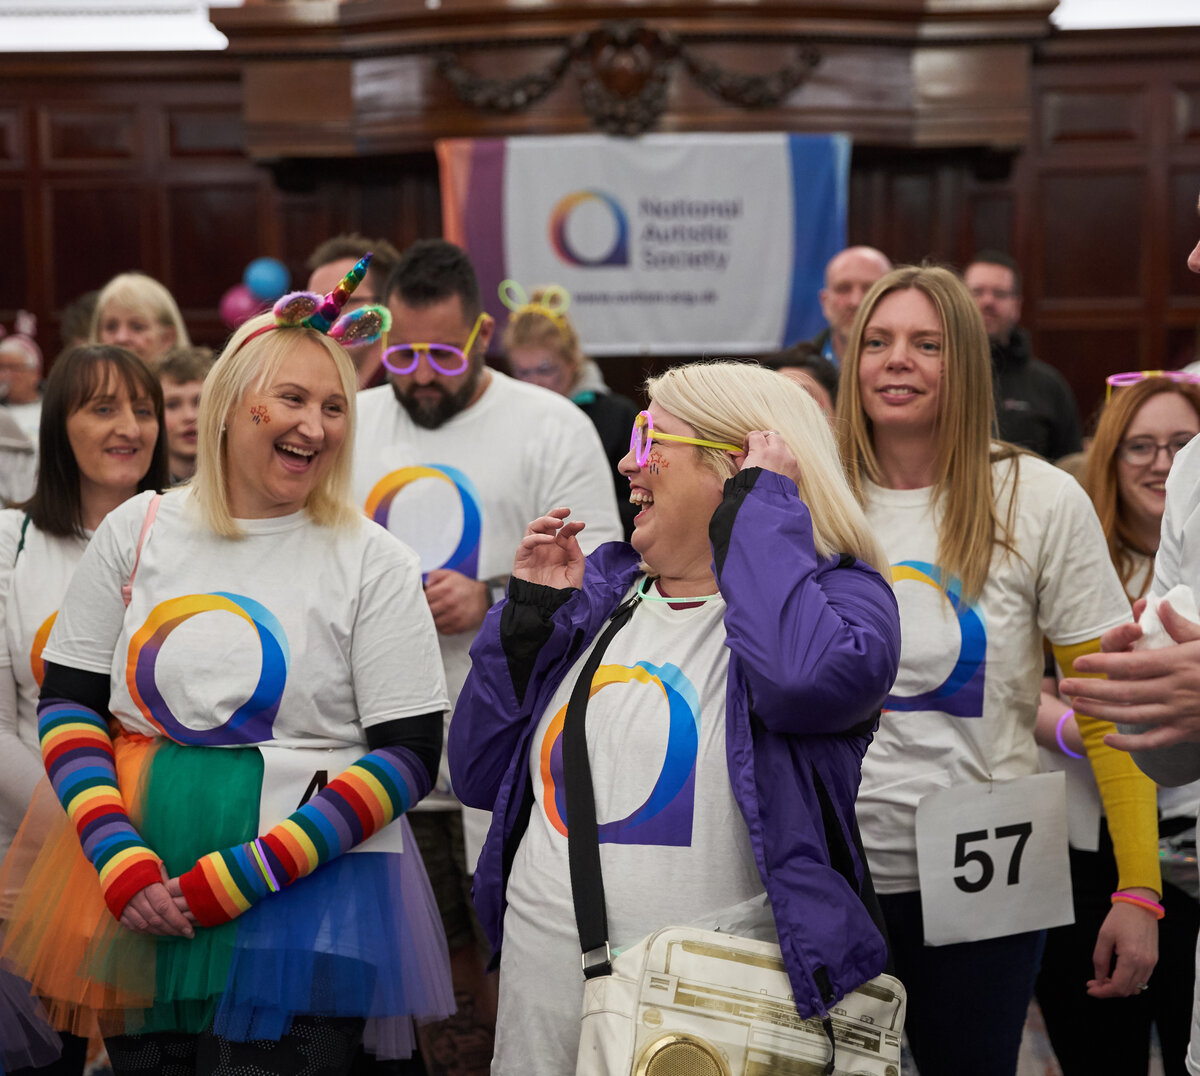 Photo : Copyright © Simon Ridgway, 2019 |www.simonridgway.com |pictures@simonridgway.com | 07973 442527 | Caption : National Autistic Society's Spectrum Night Walk, Cardiff.